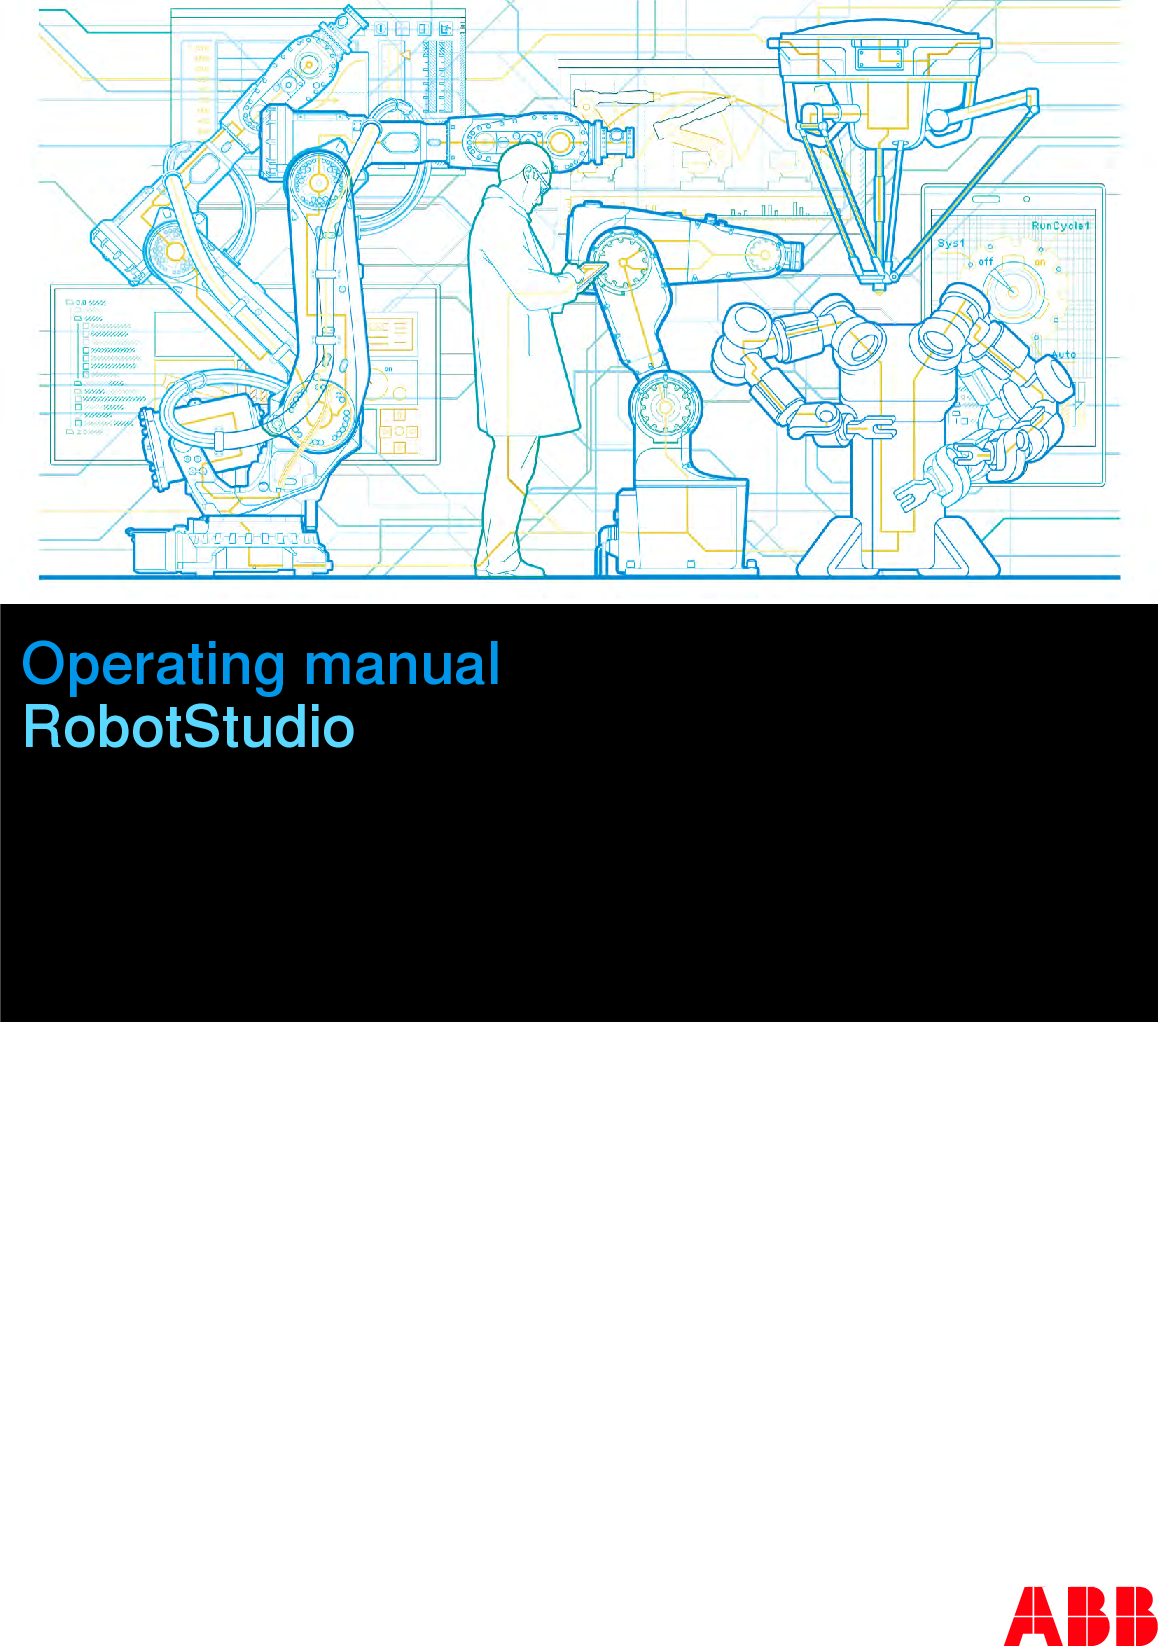 abb robotstudio license key